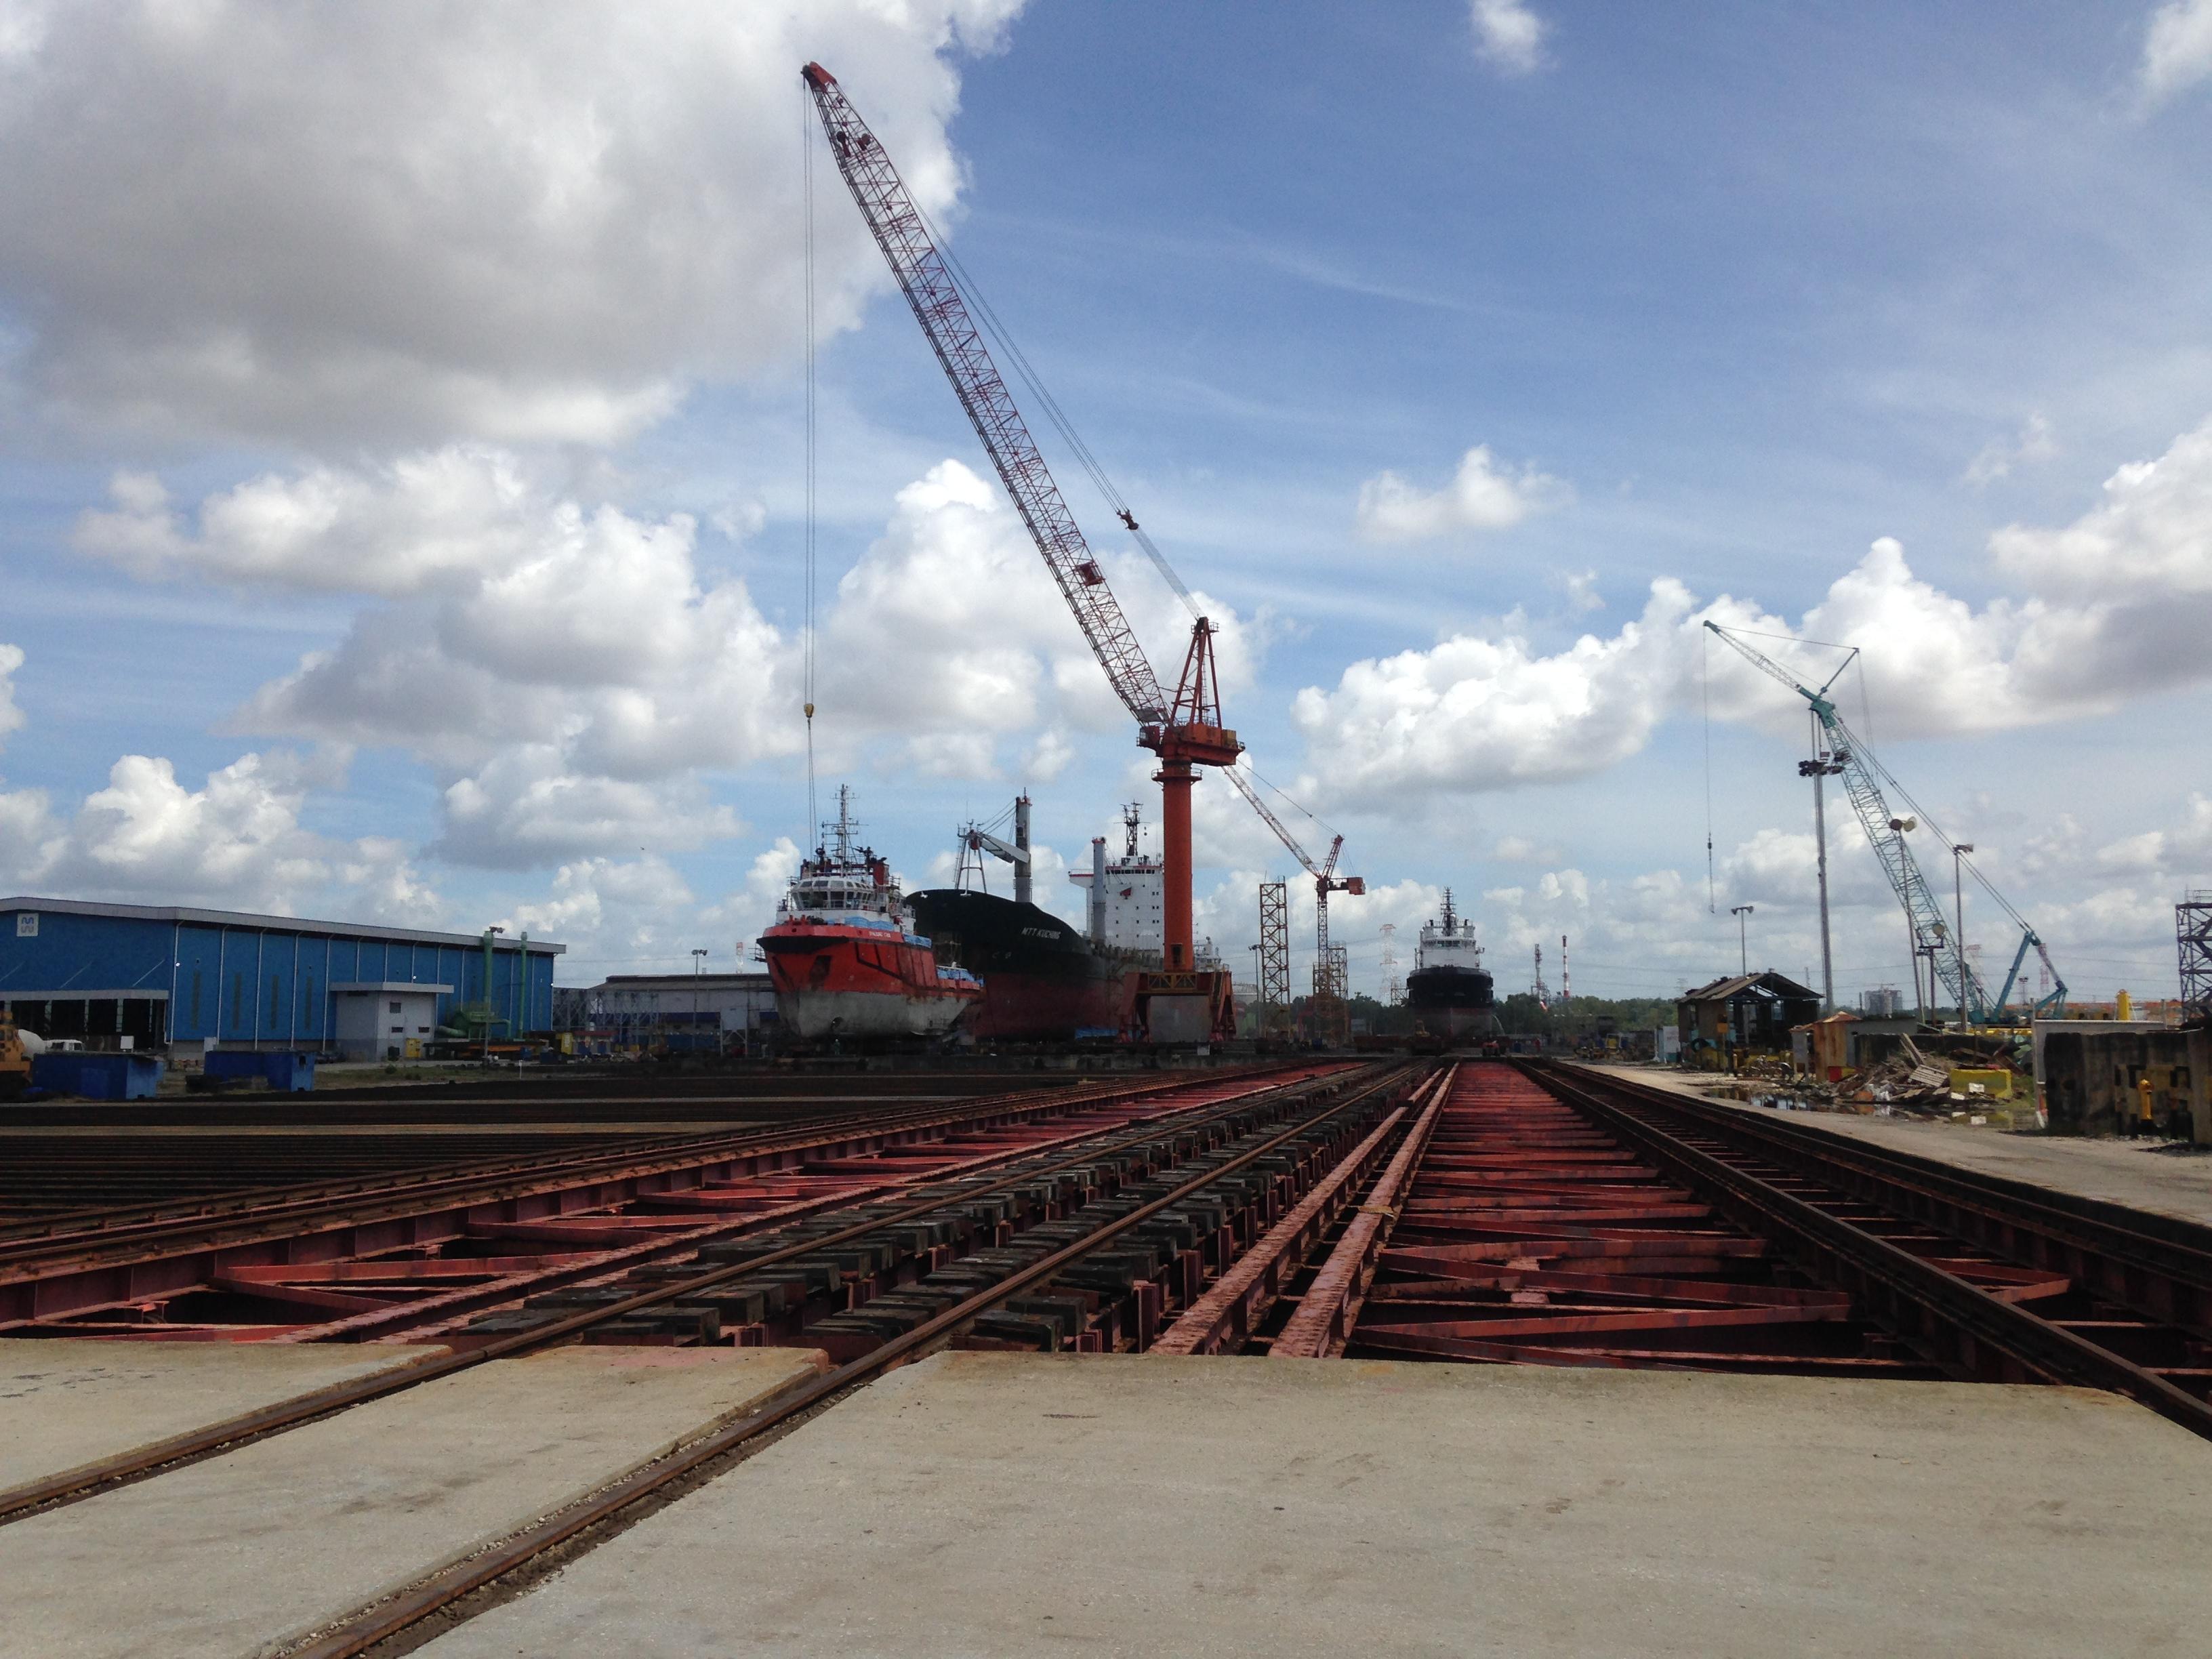 Malaysia Marine Heavy Engineering Sdn Bhd